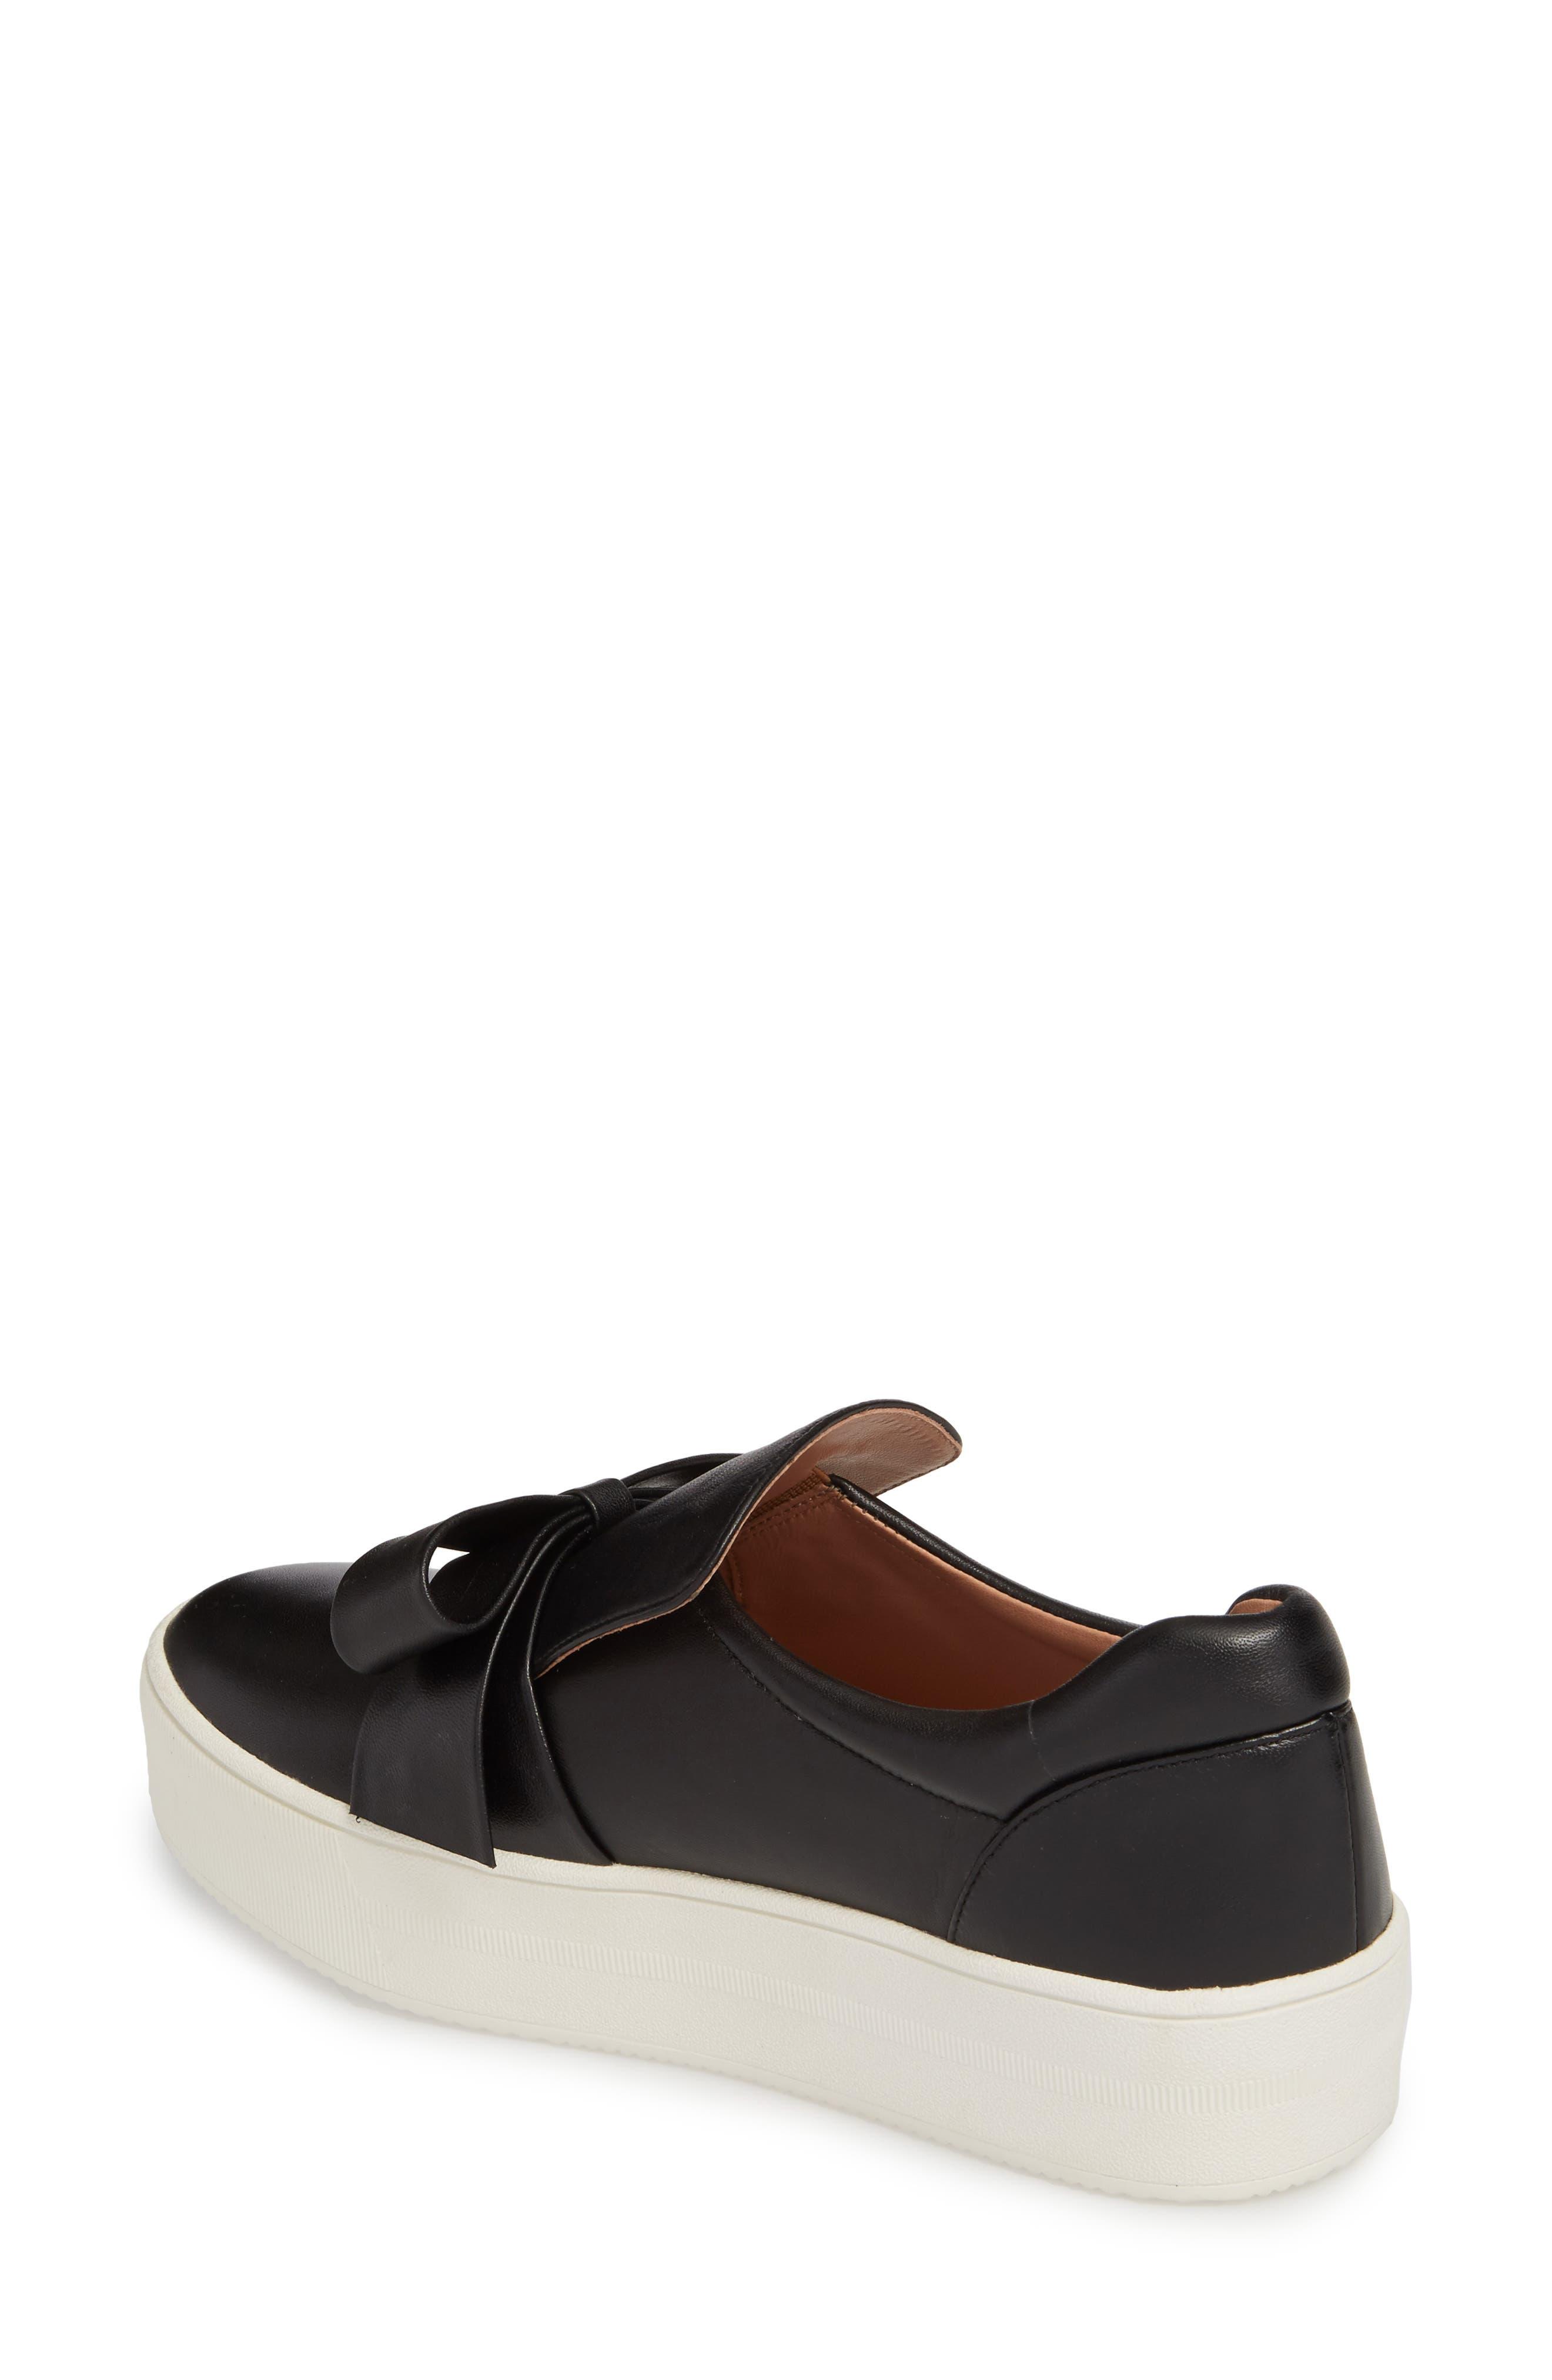 Vania Bow Platform Sneaker,                             Alternate thumbnail 2, color,                             001